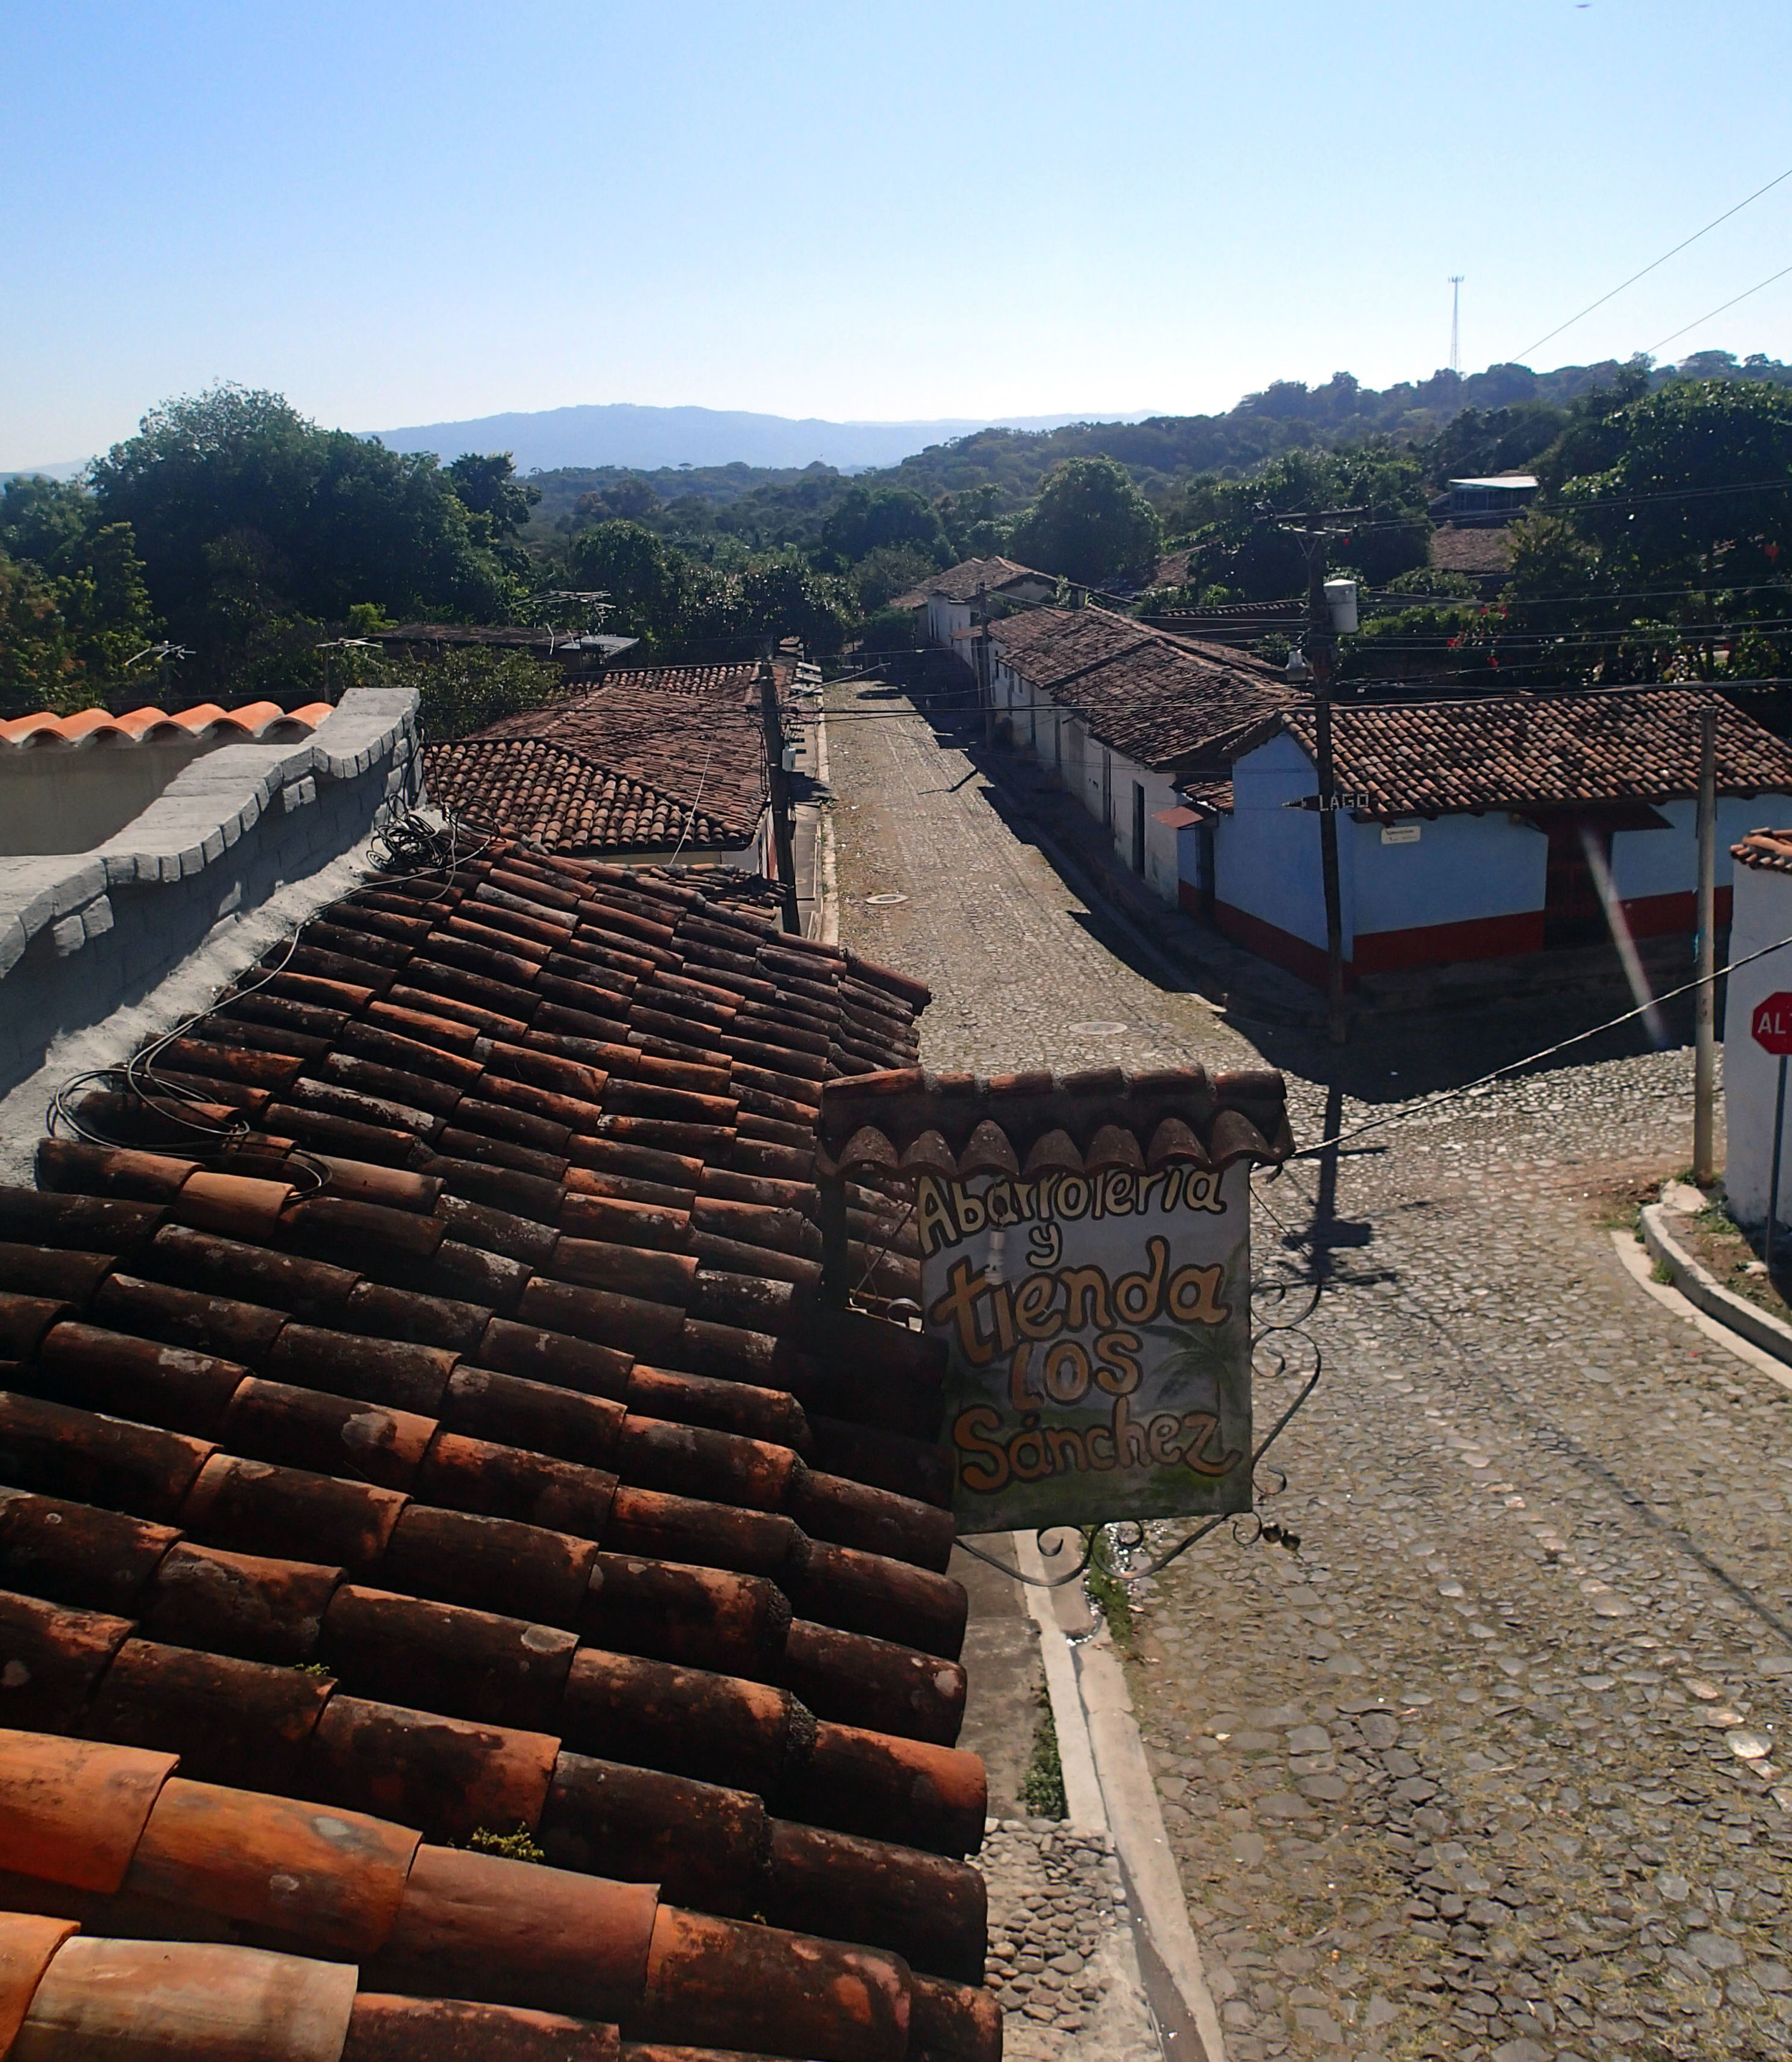 view from Hostal Los Sanchez.jpg